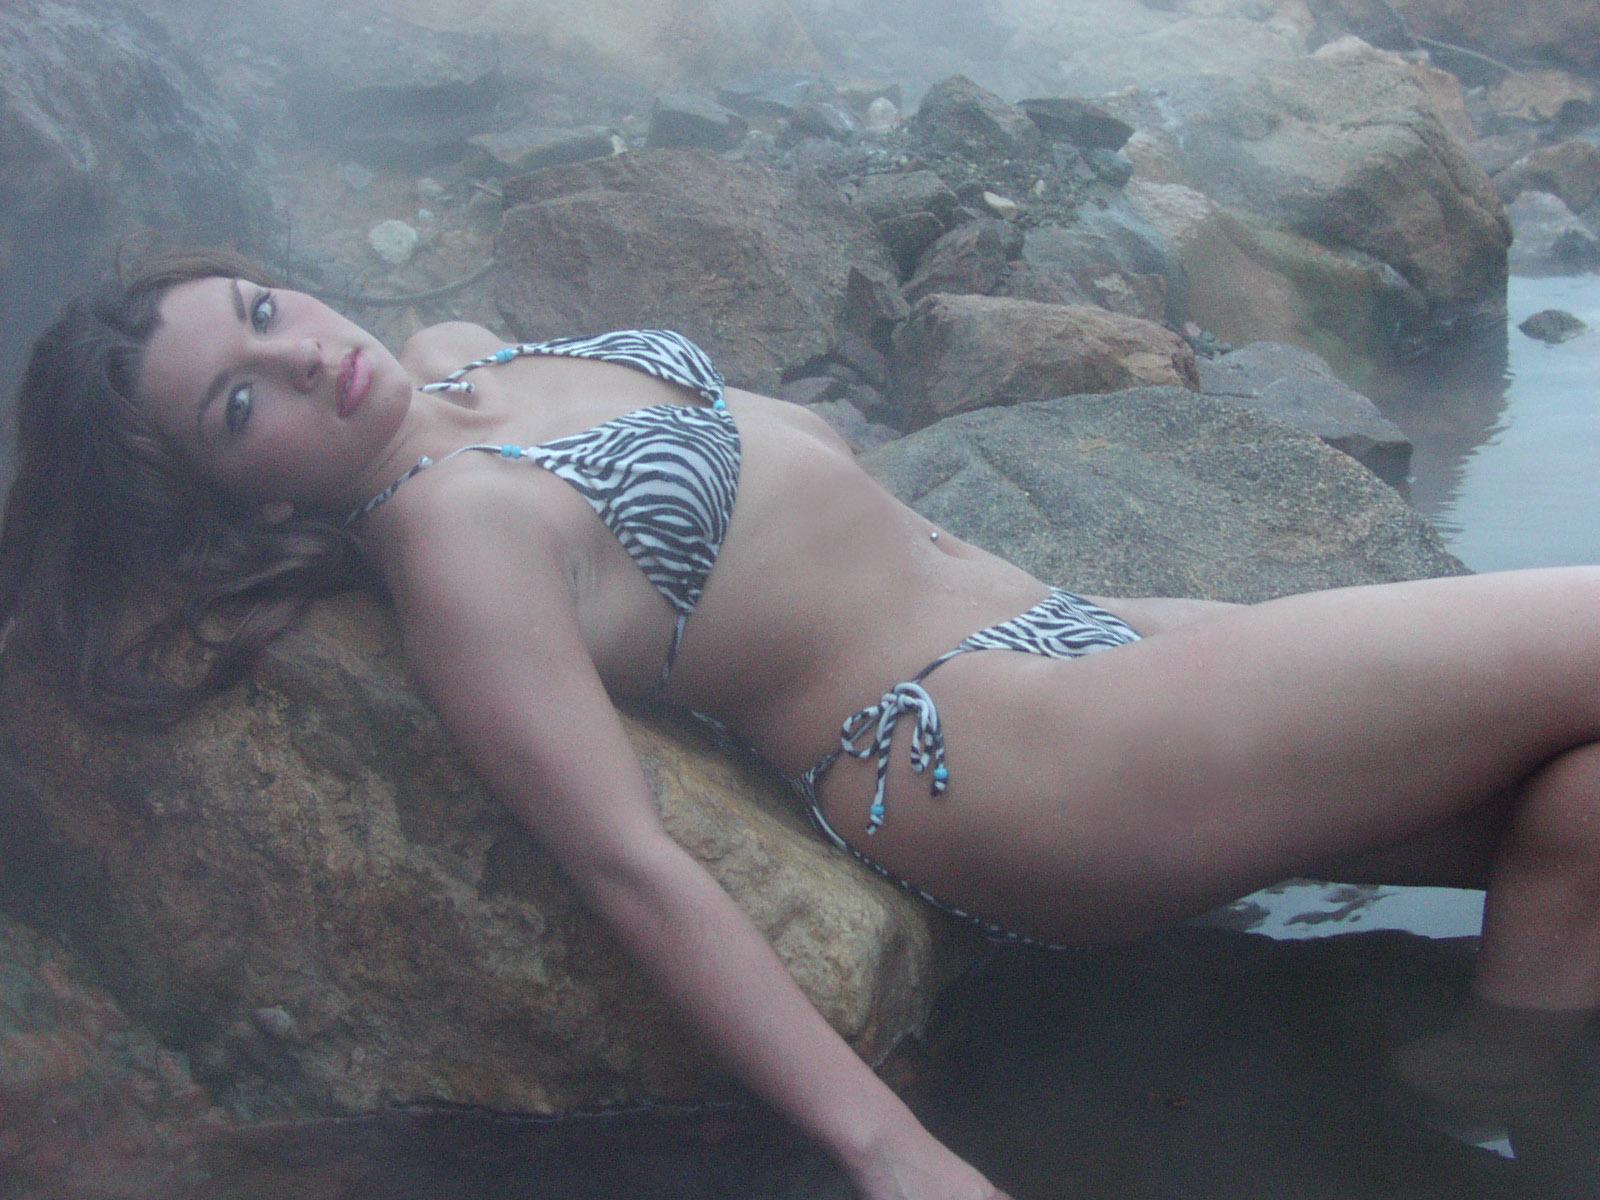 swimsuit2.jpg